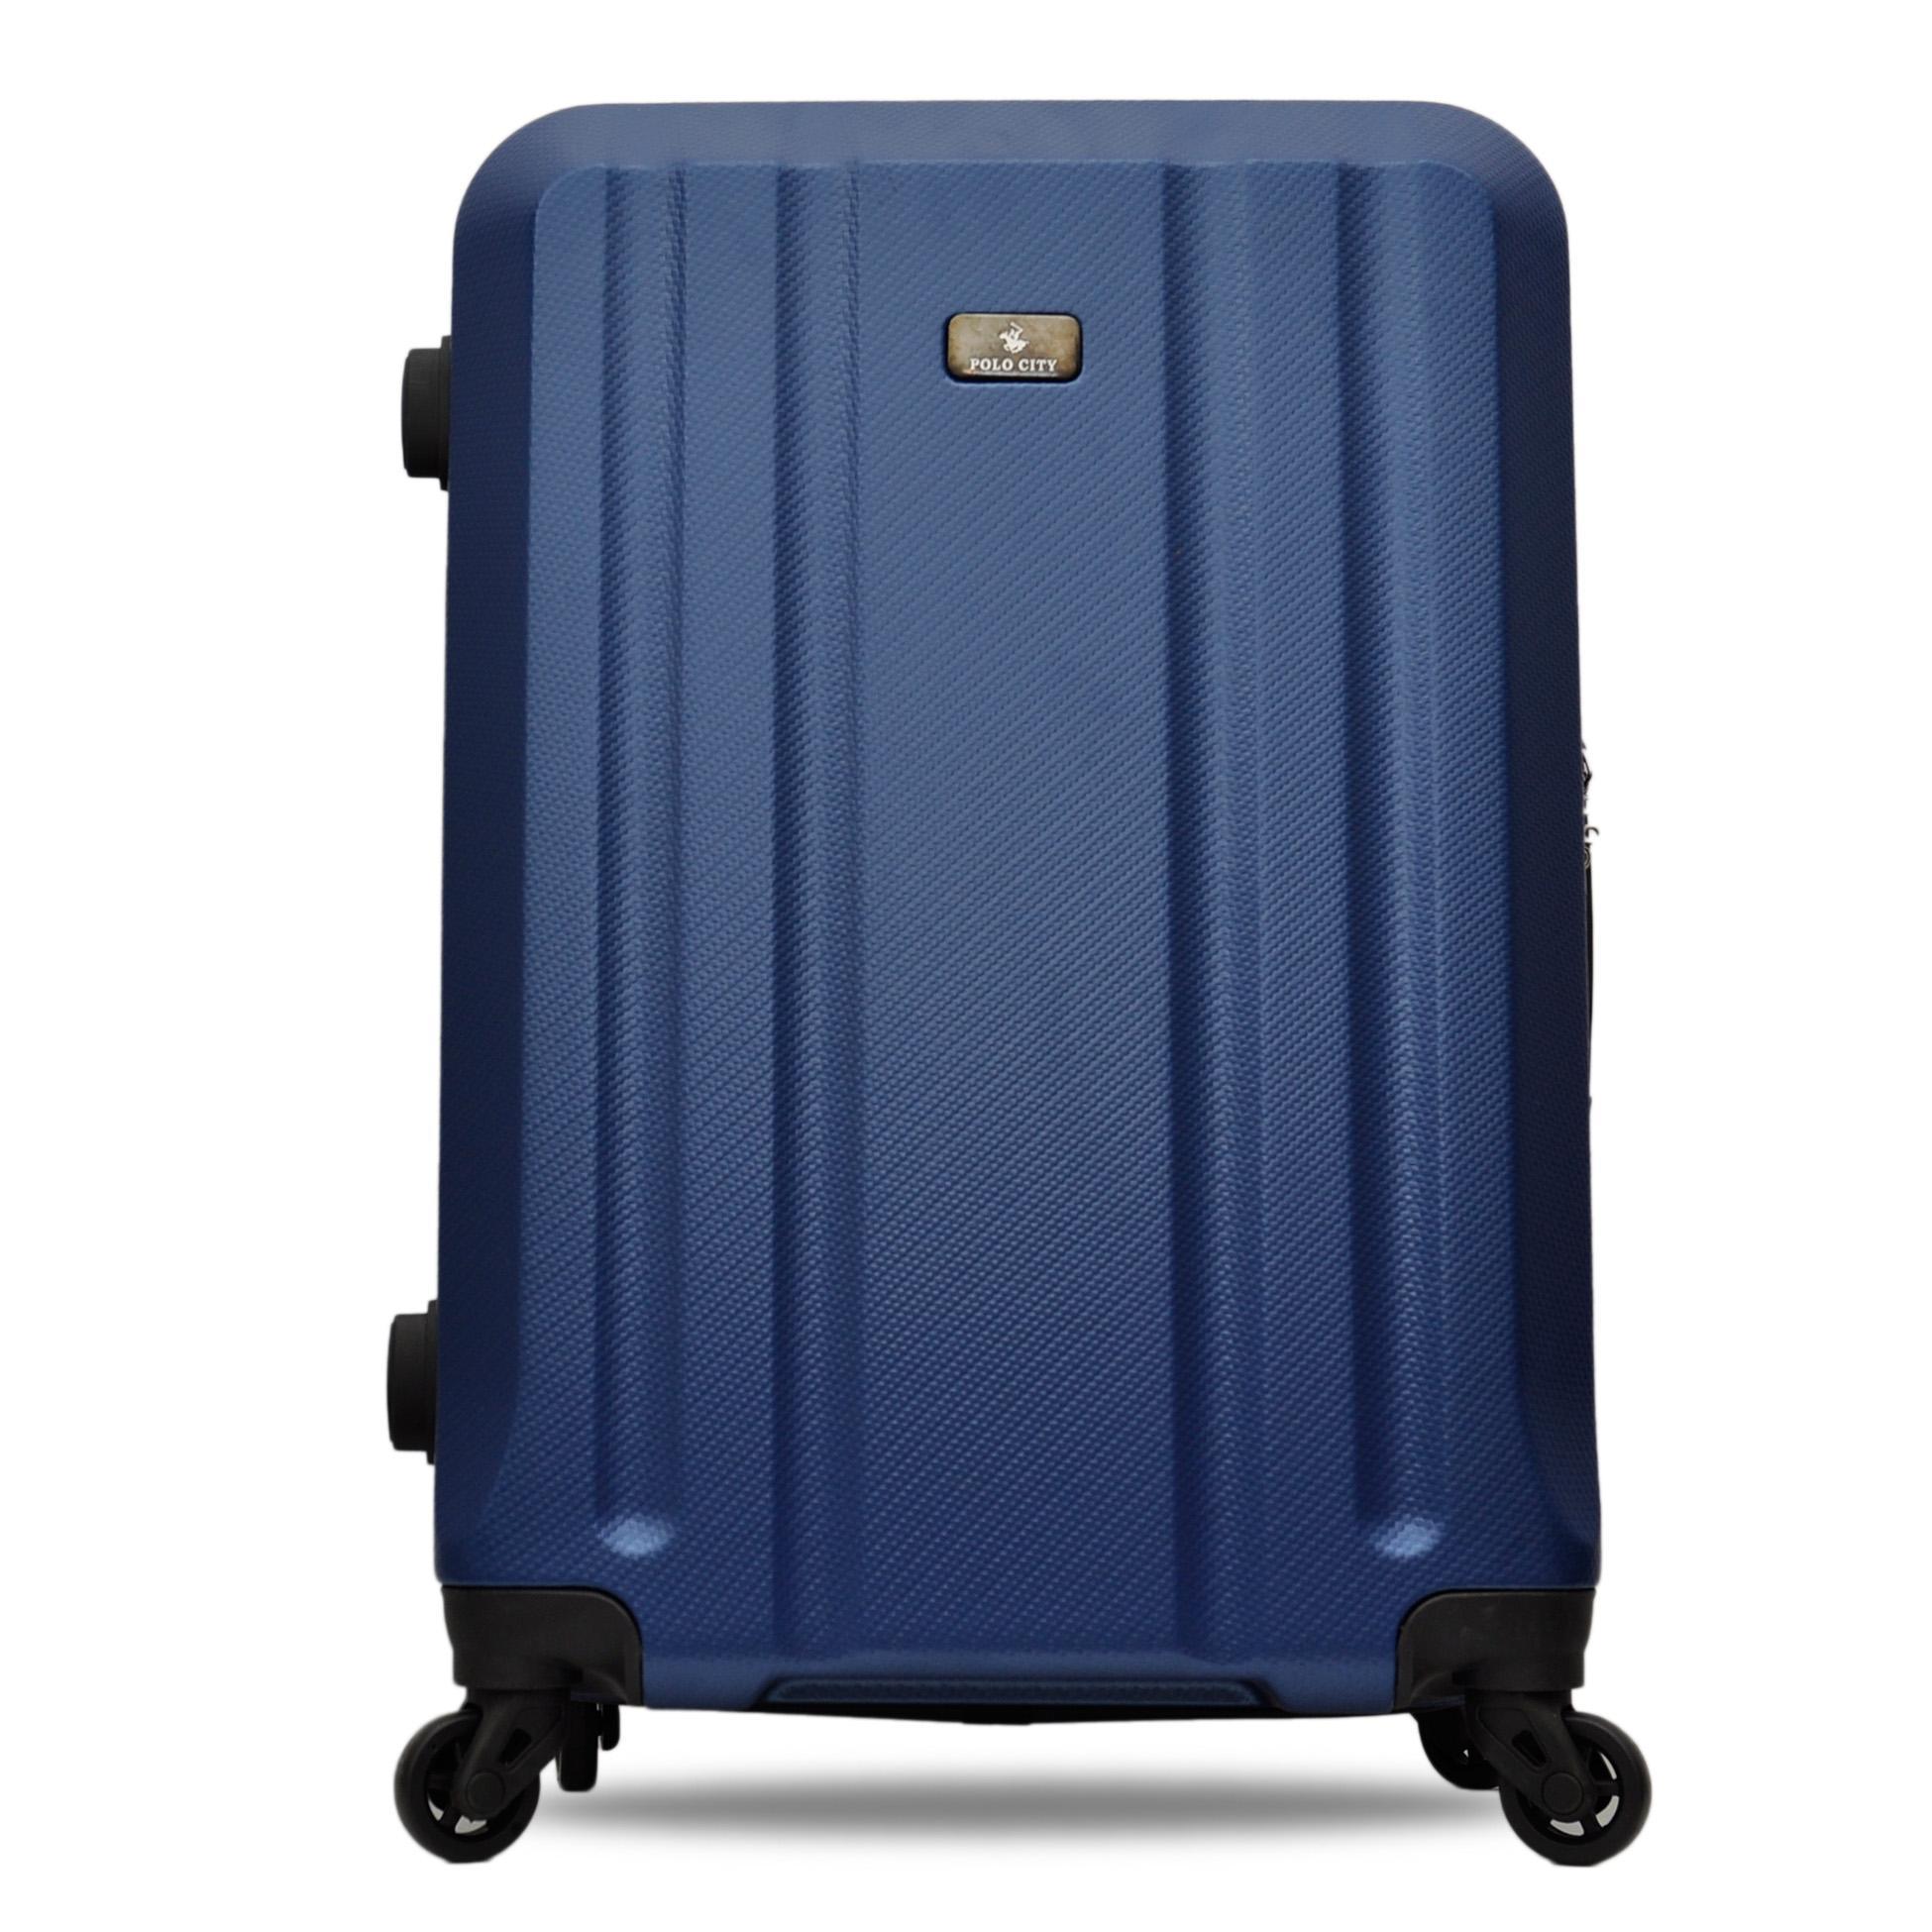 39af8e5b07 Polo City Tas Koper Hardcase Kabin Size 20 inch - 304